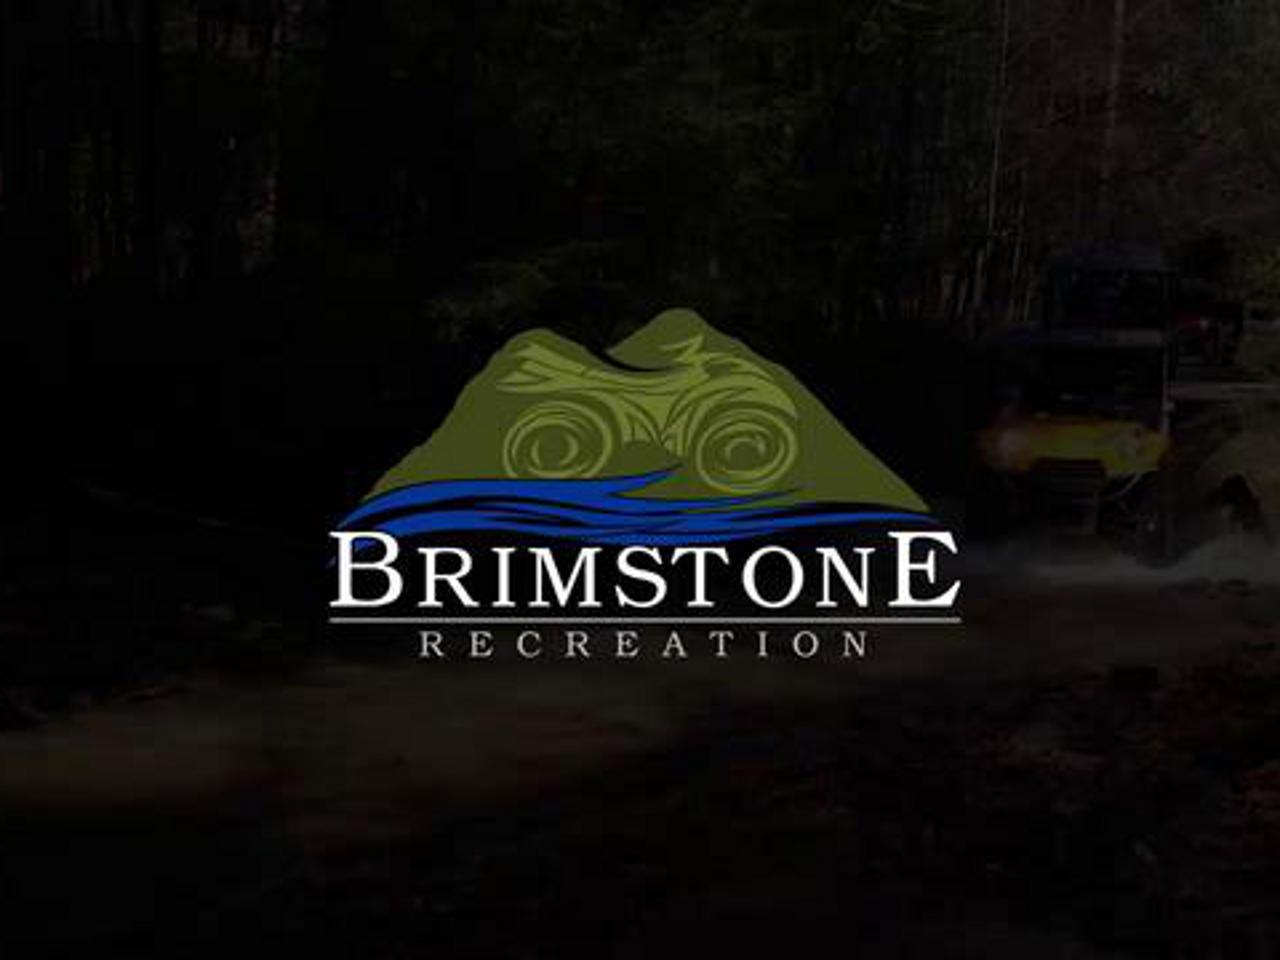 Brimstone Sxs And Atv Roundup Event Atv Illustrated